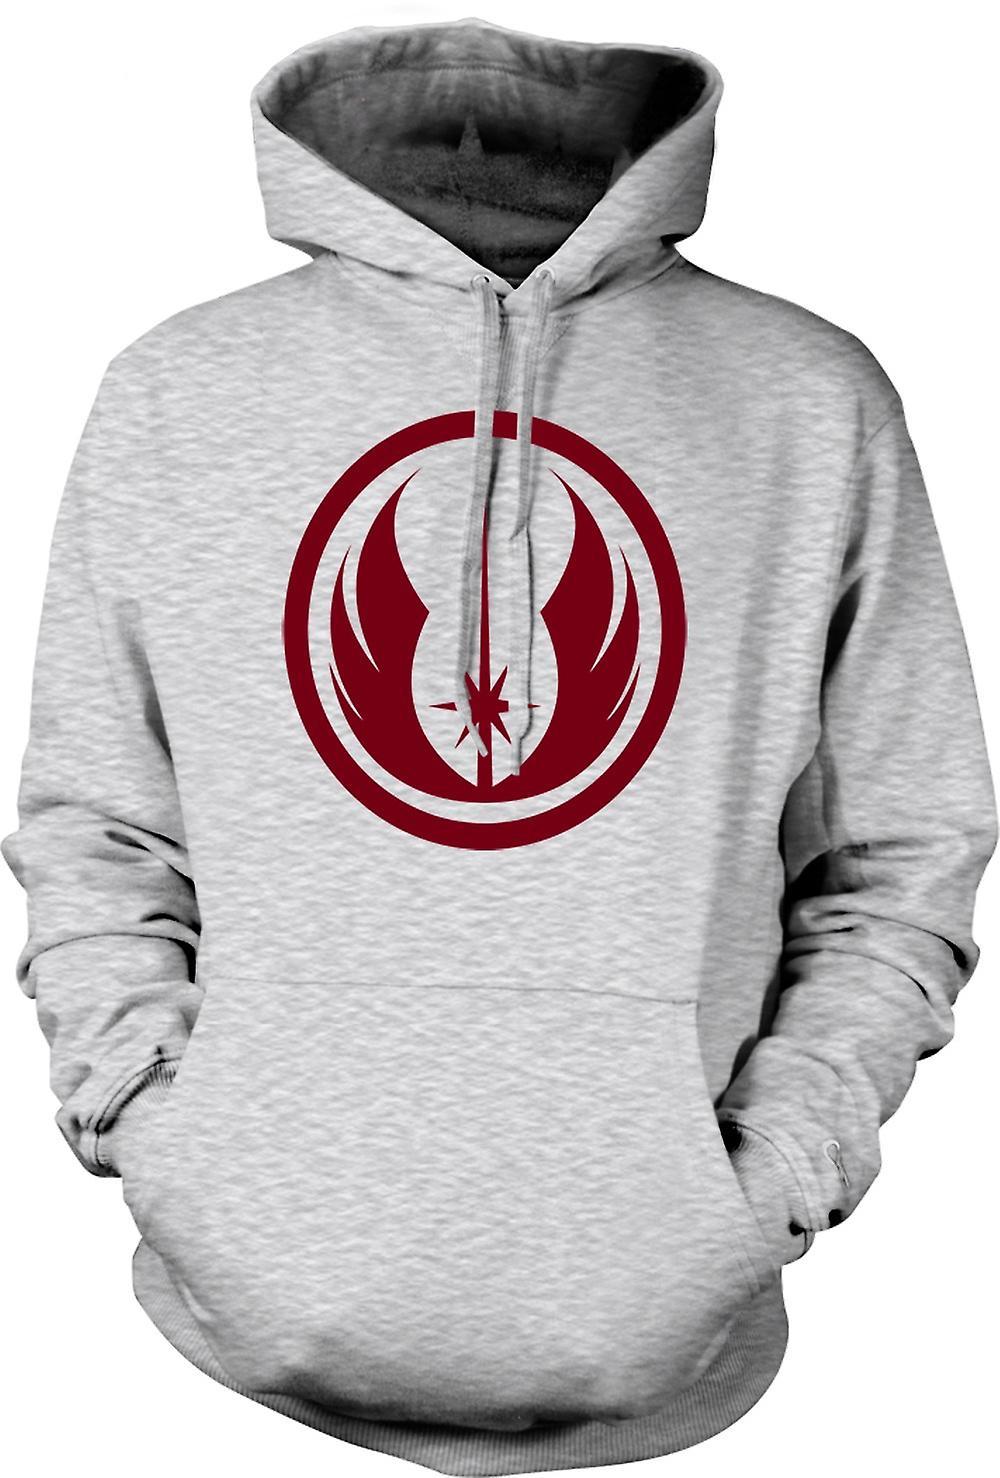 Mens Hoodie - ordine Jedi - Star Wars